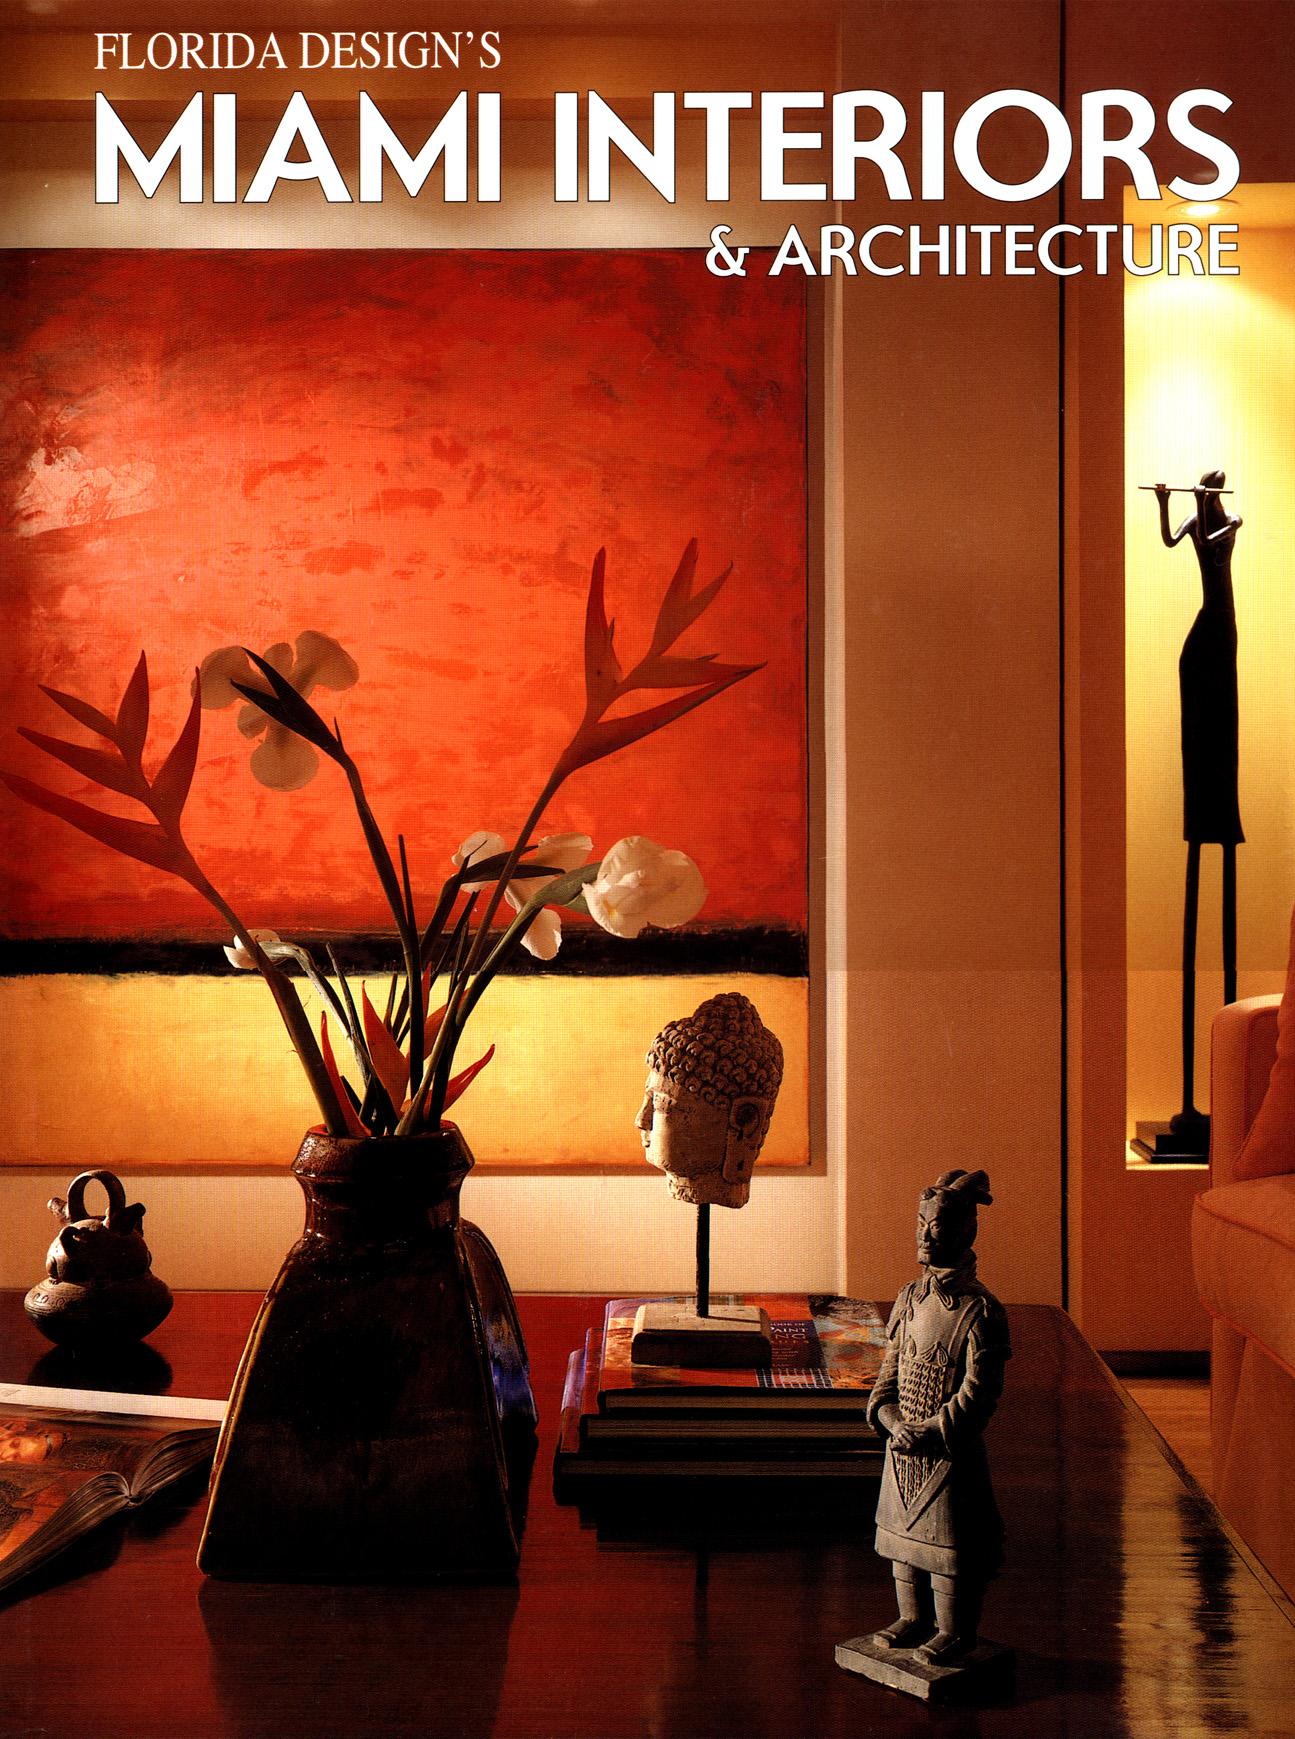 florida design book cover.JPG